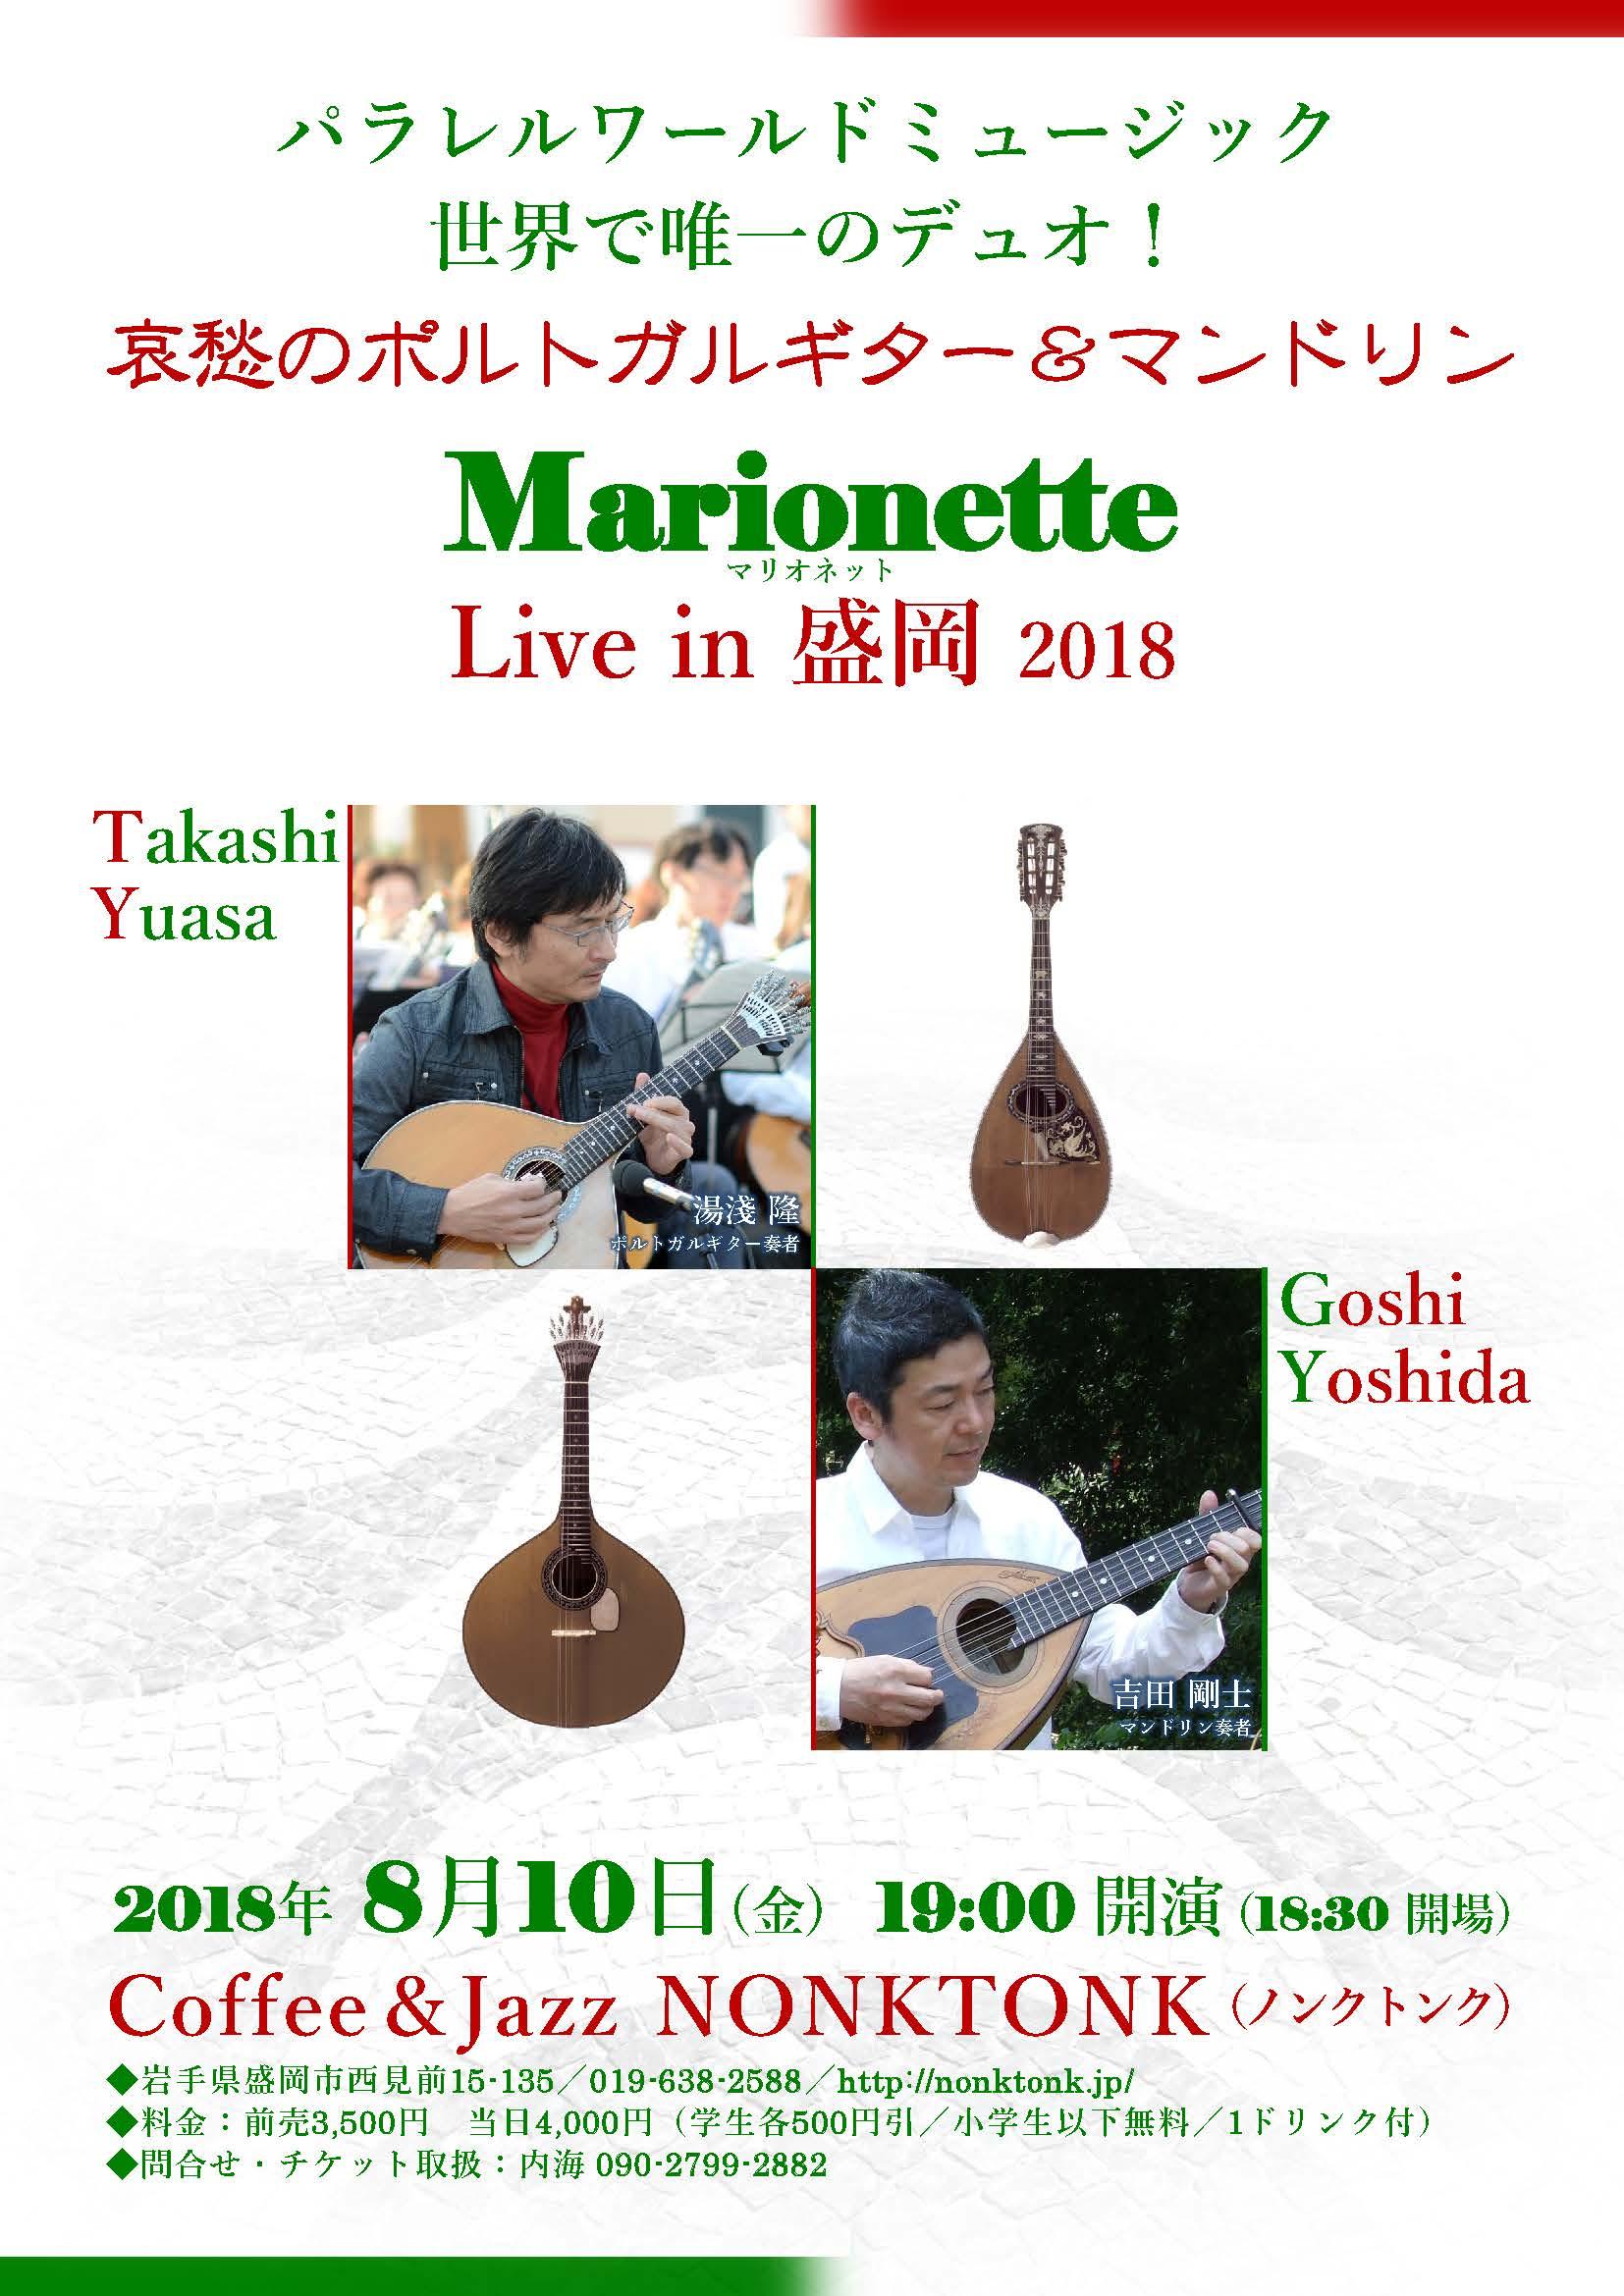 Marionette(マリオネット)Live in 盛岡 2018